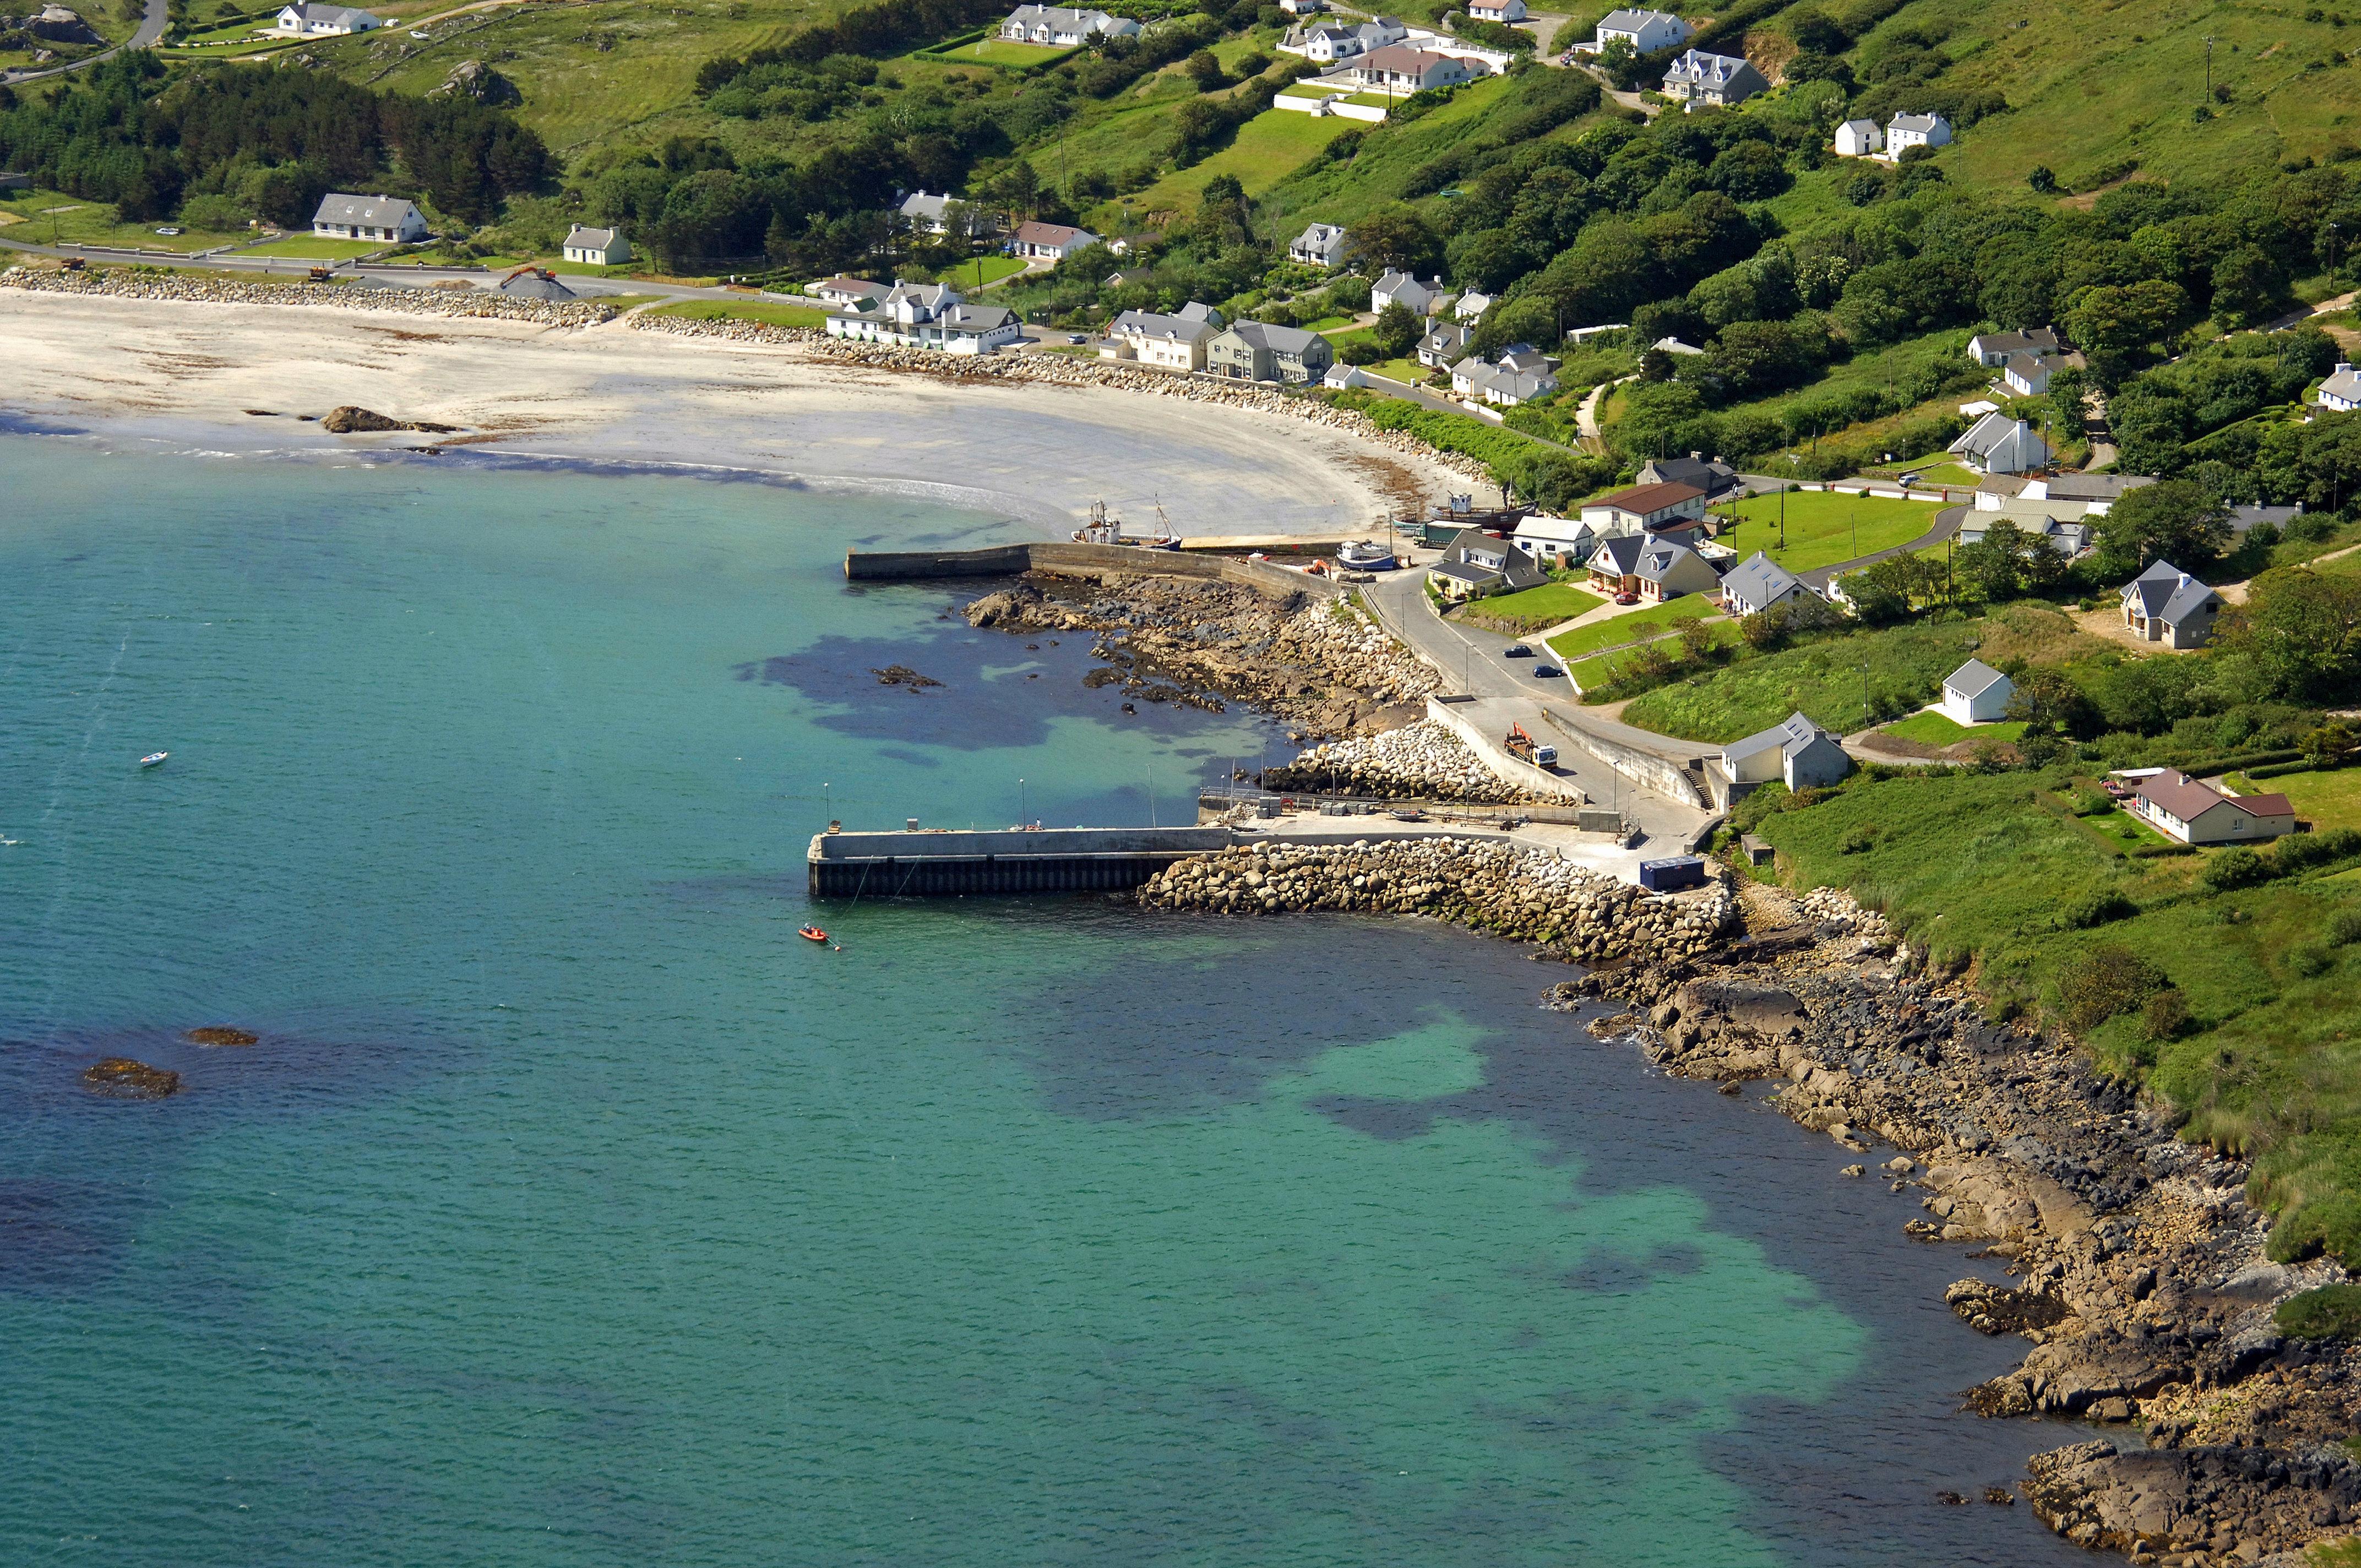 Leabgarrow Pier Arranmore Ferry In Leabgarrow Arranmore Island County Donegal Ireland Ferry Reviews Phone Number Marinas Com